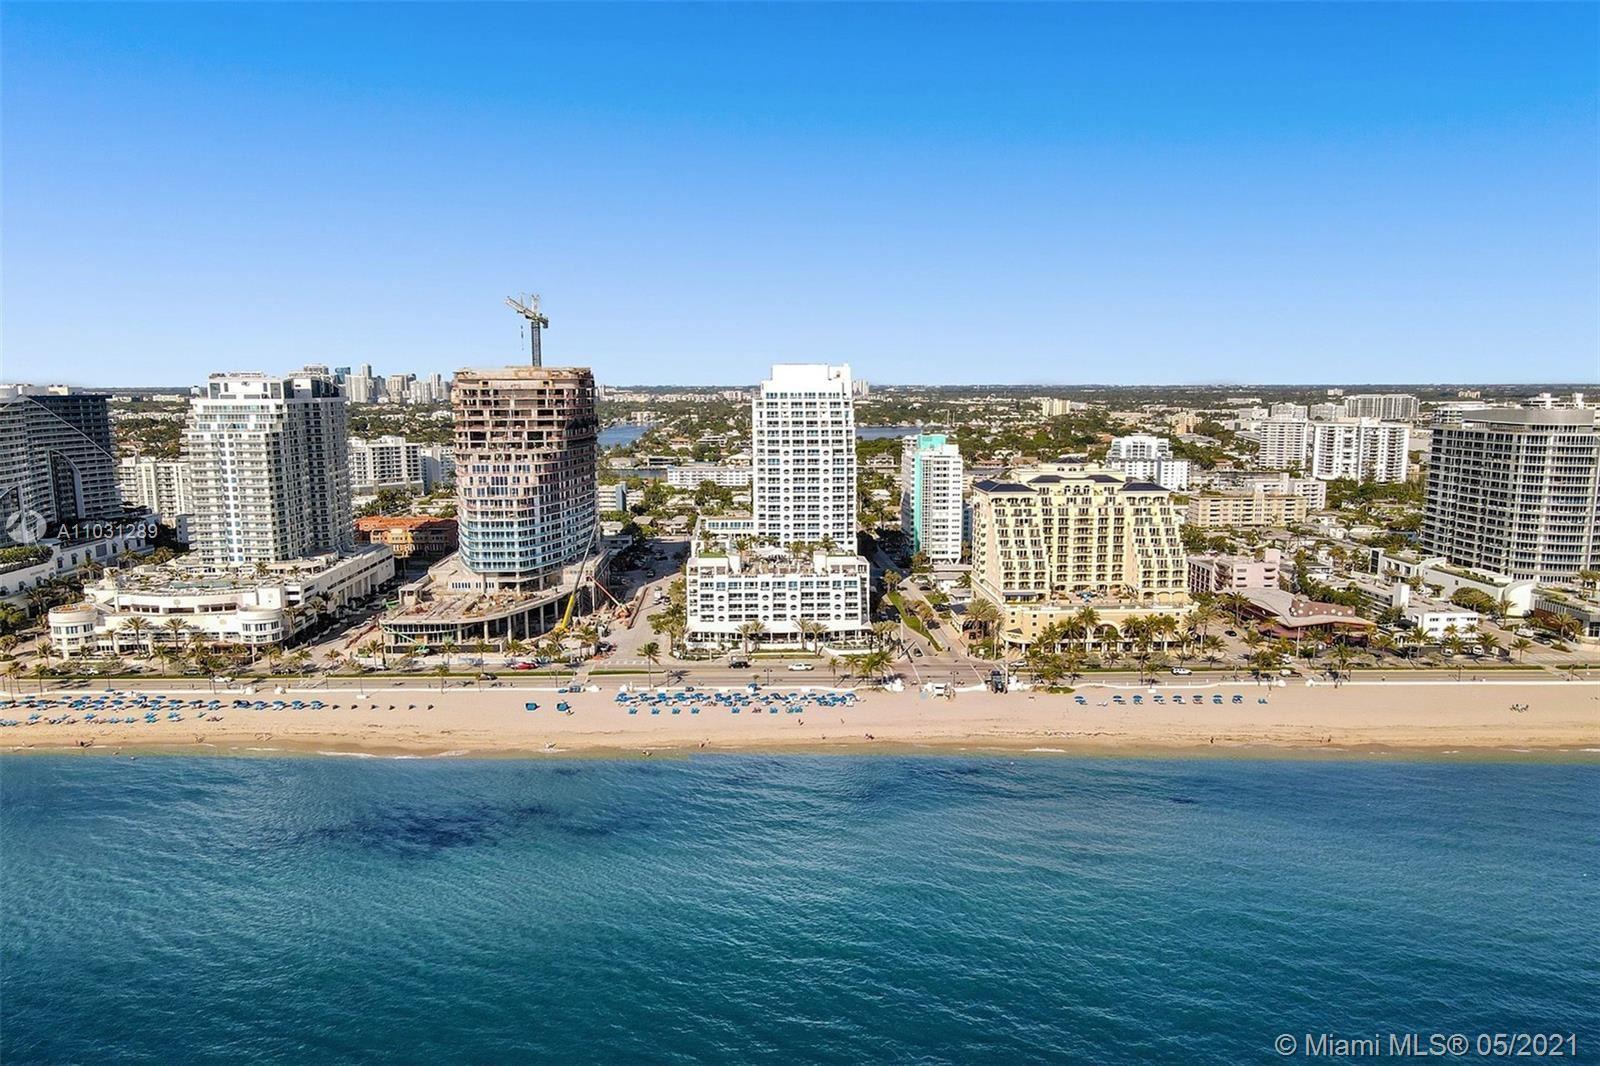 551 N Fort Lauderdale Beach Blvd #H1501, Fort Lauderdale, FL 33304 - #: A11031289